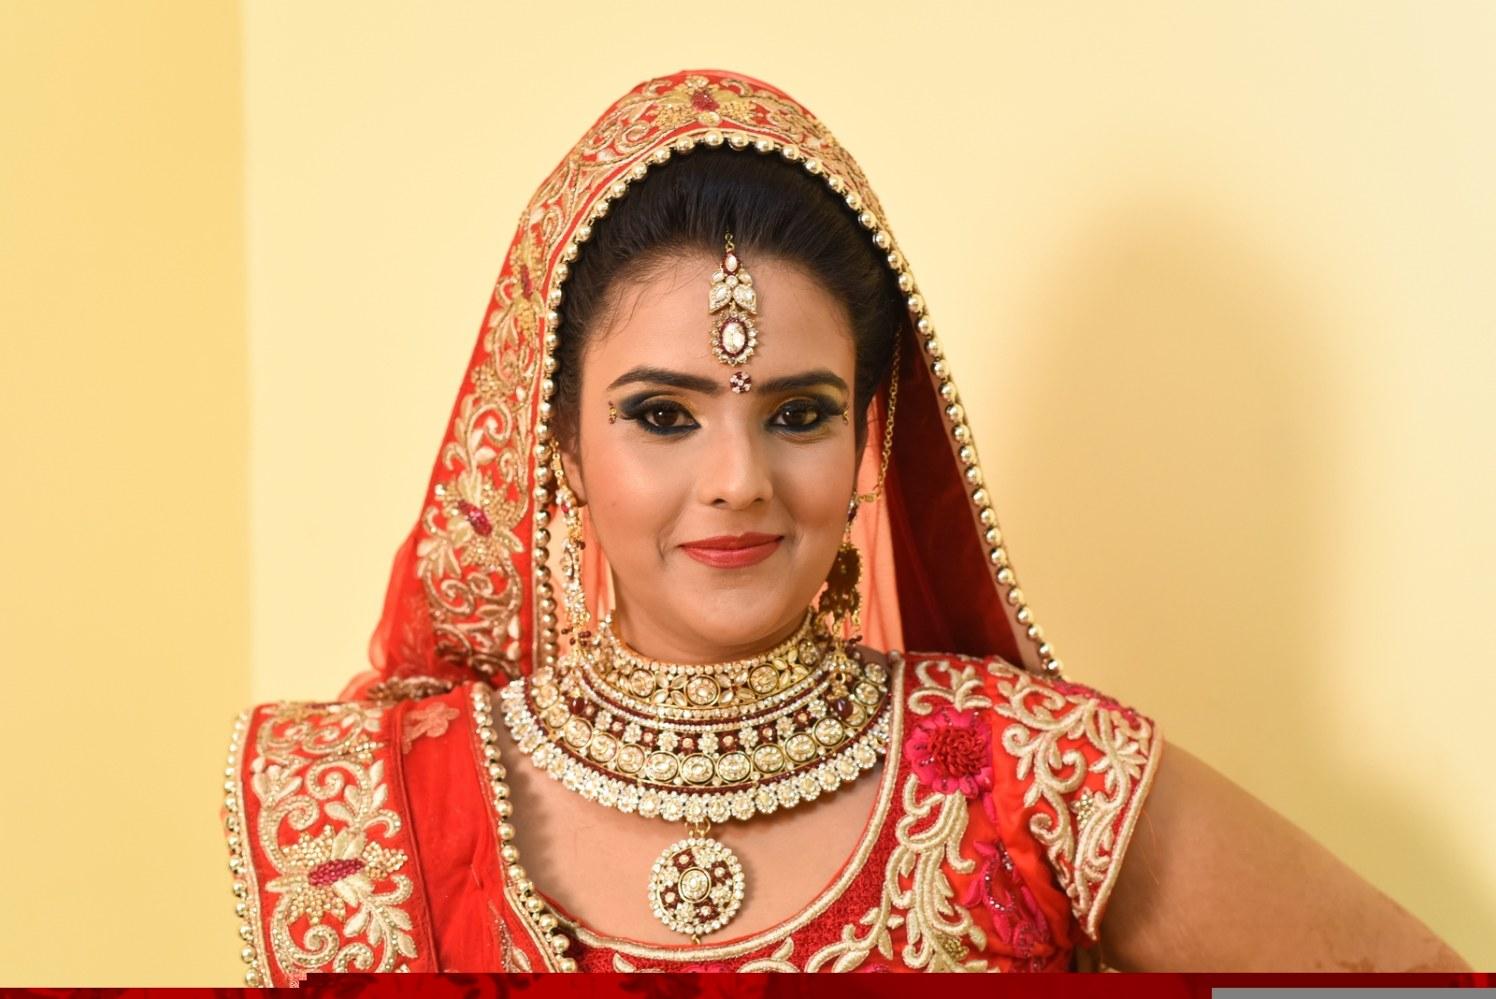 Bridal makeup done right by Richa Malik Bridal-makeup | Weddings Photos & Ideas